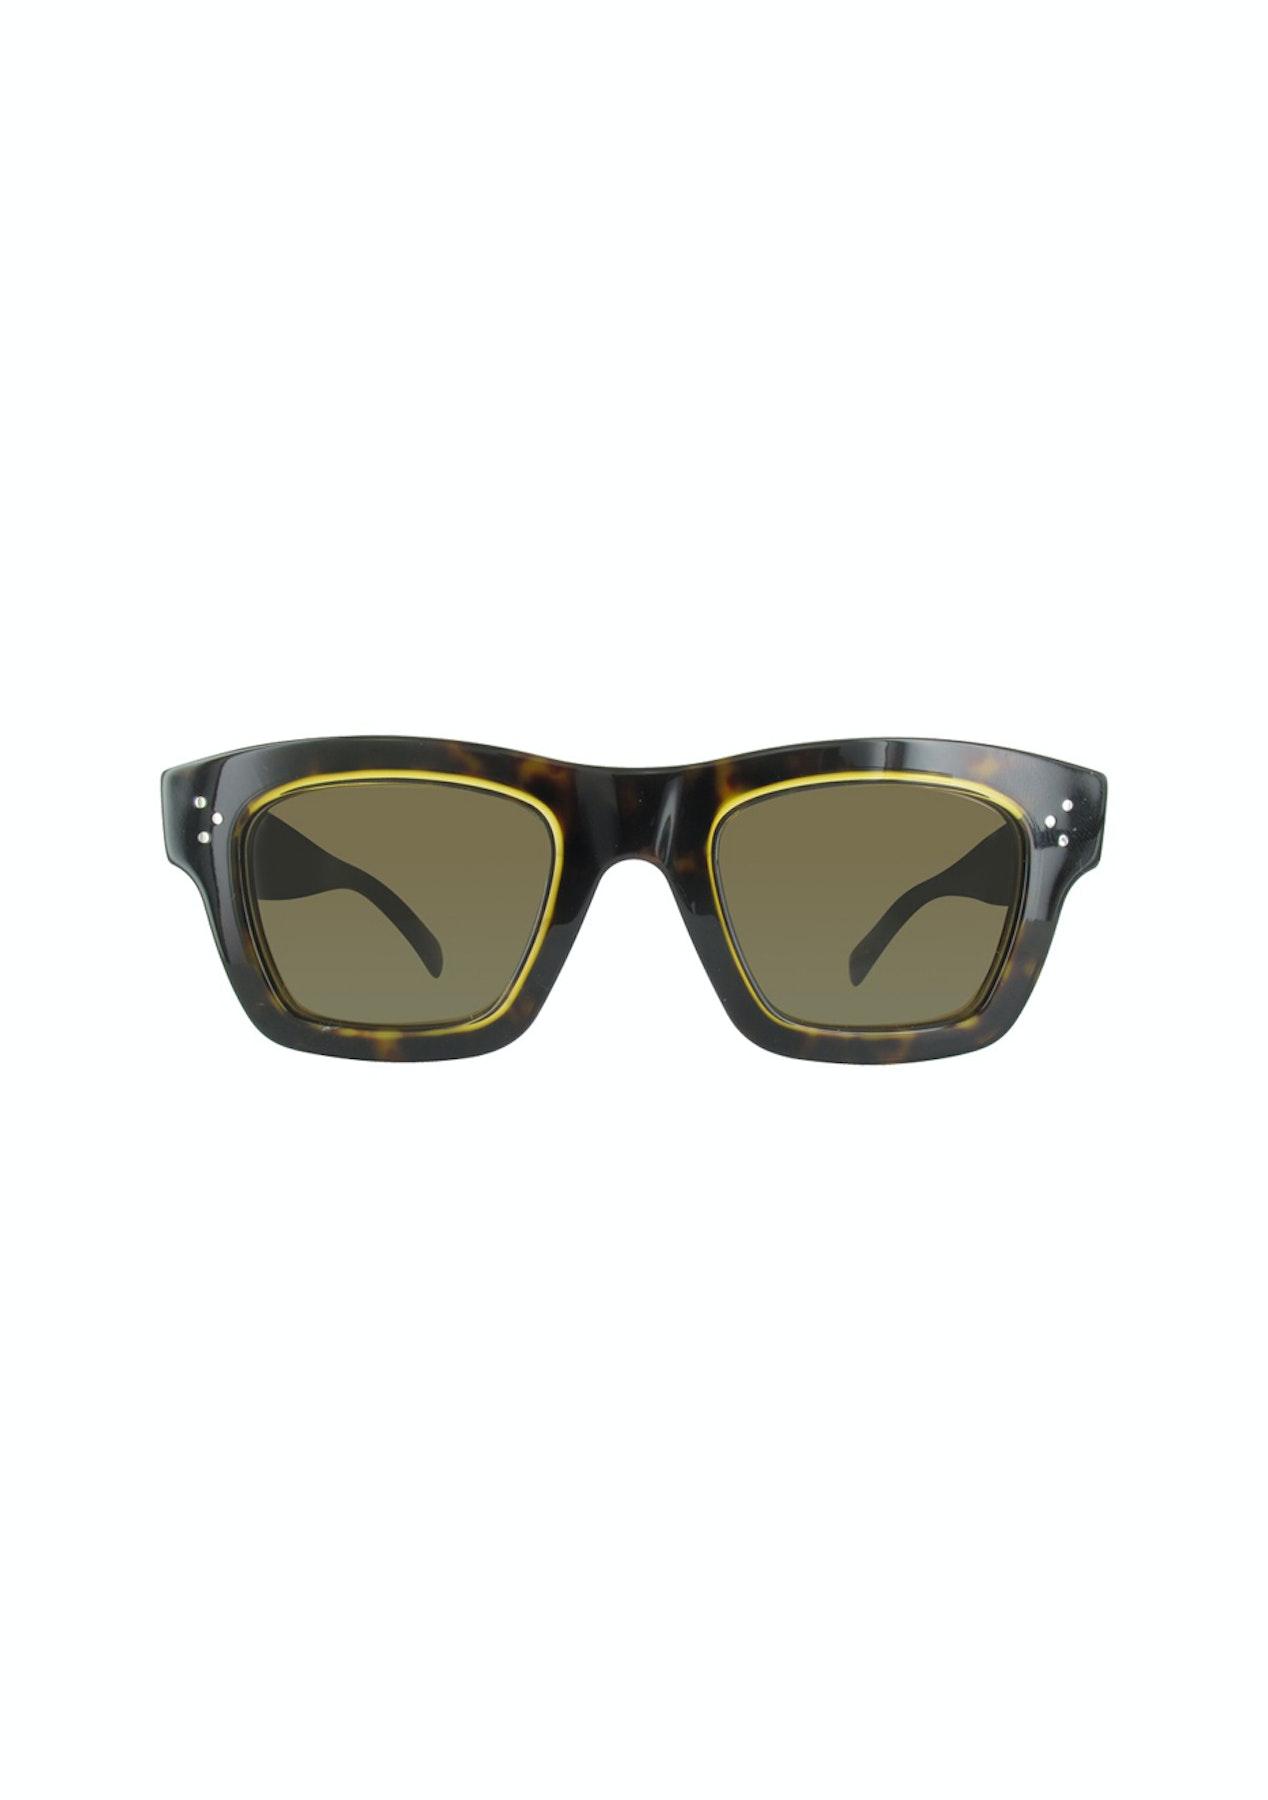 d8c622171ab8 Celine Dark Havana  Honey Sunglasses - Designer Sunglasses Sale - Onceit